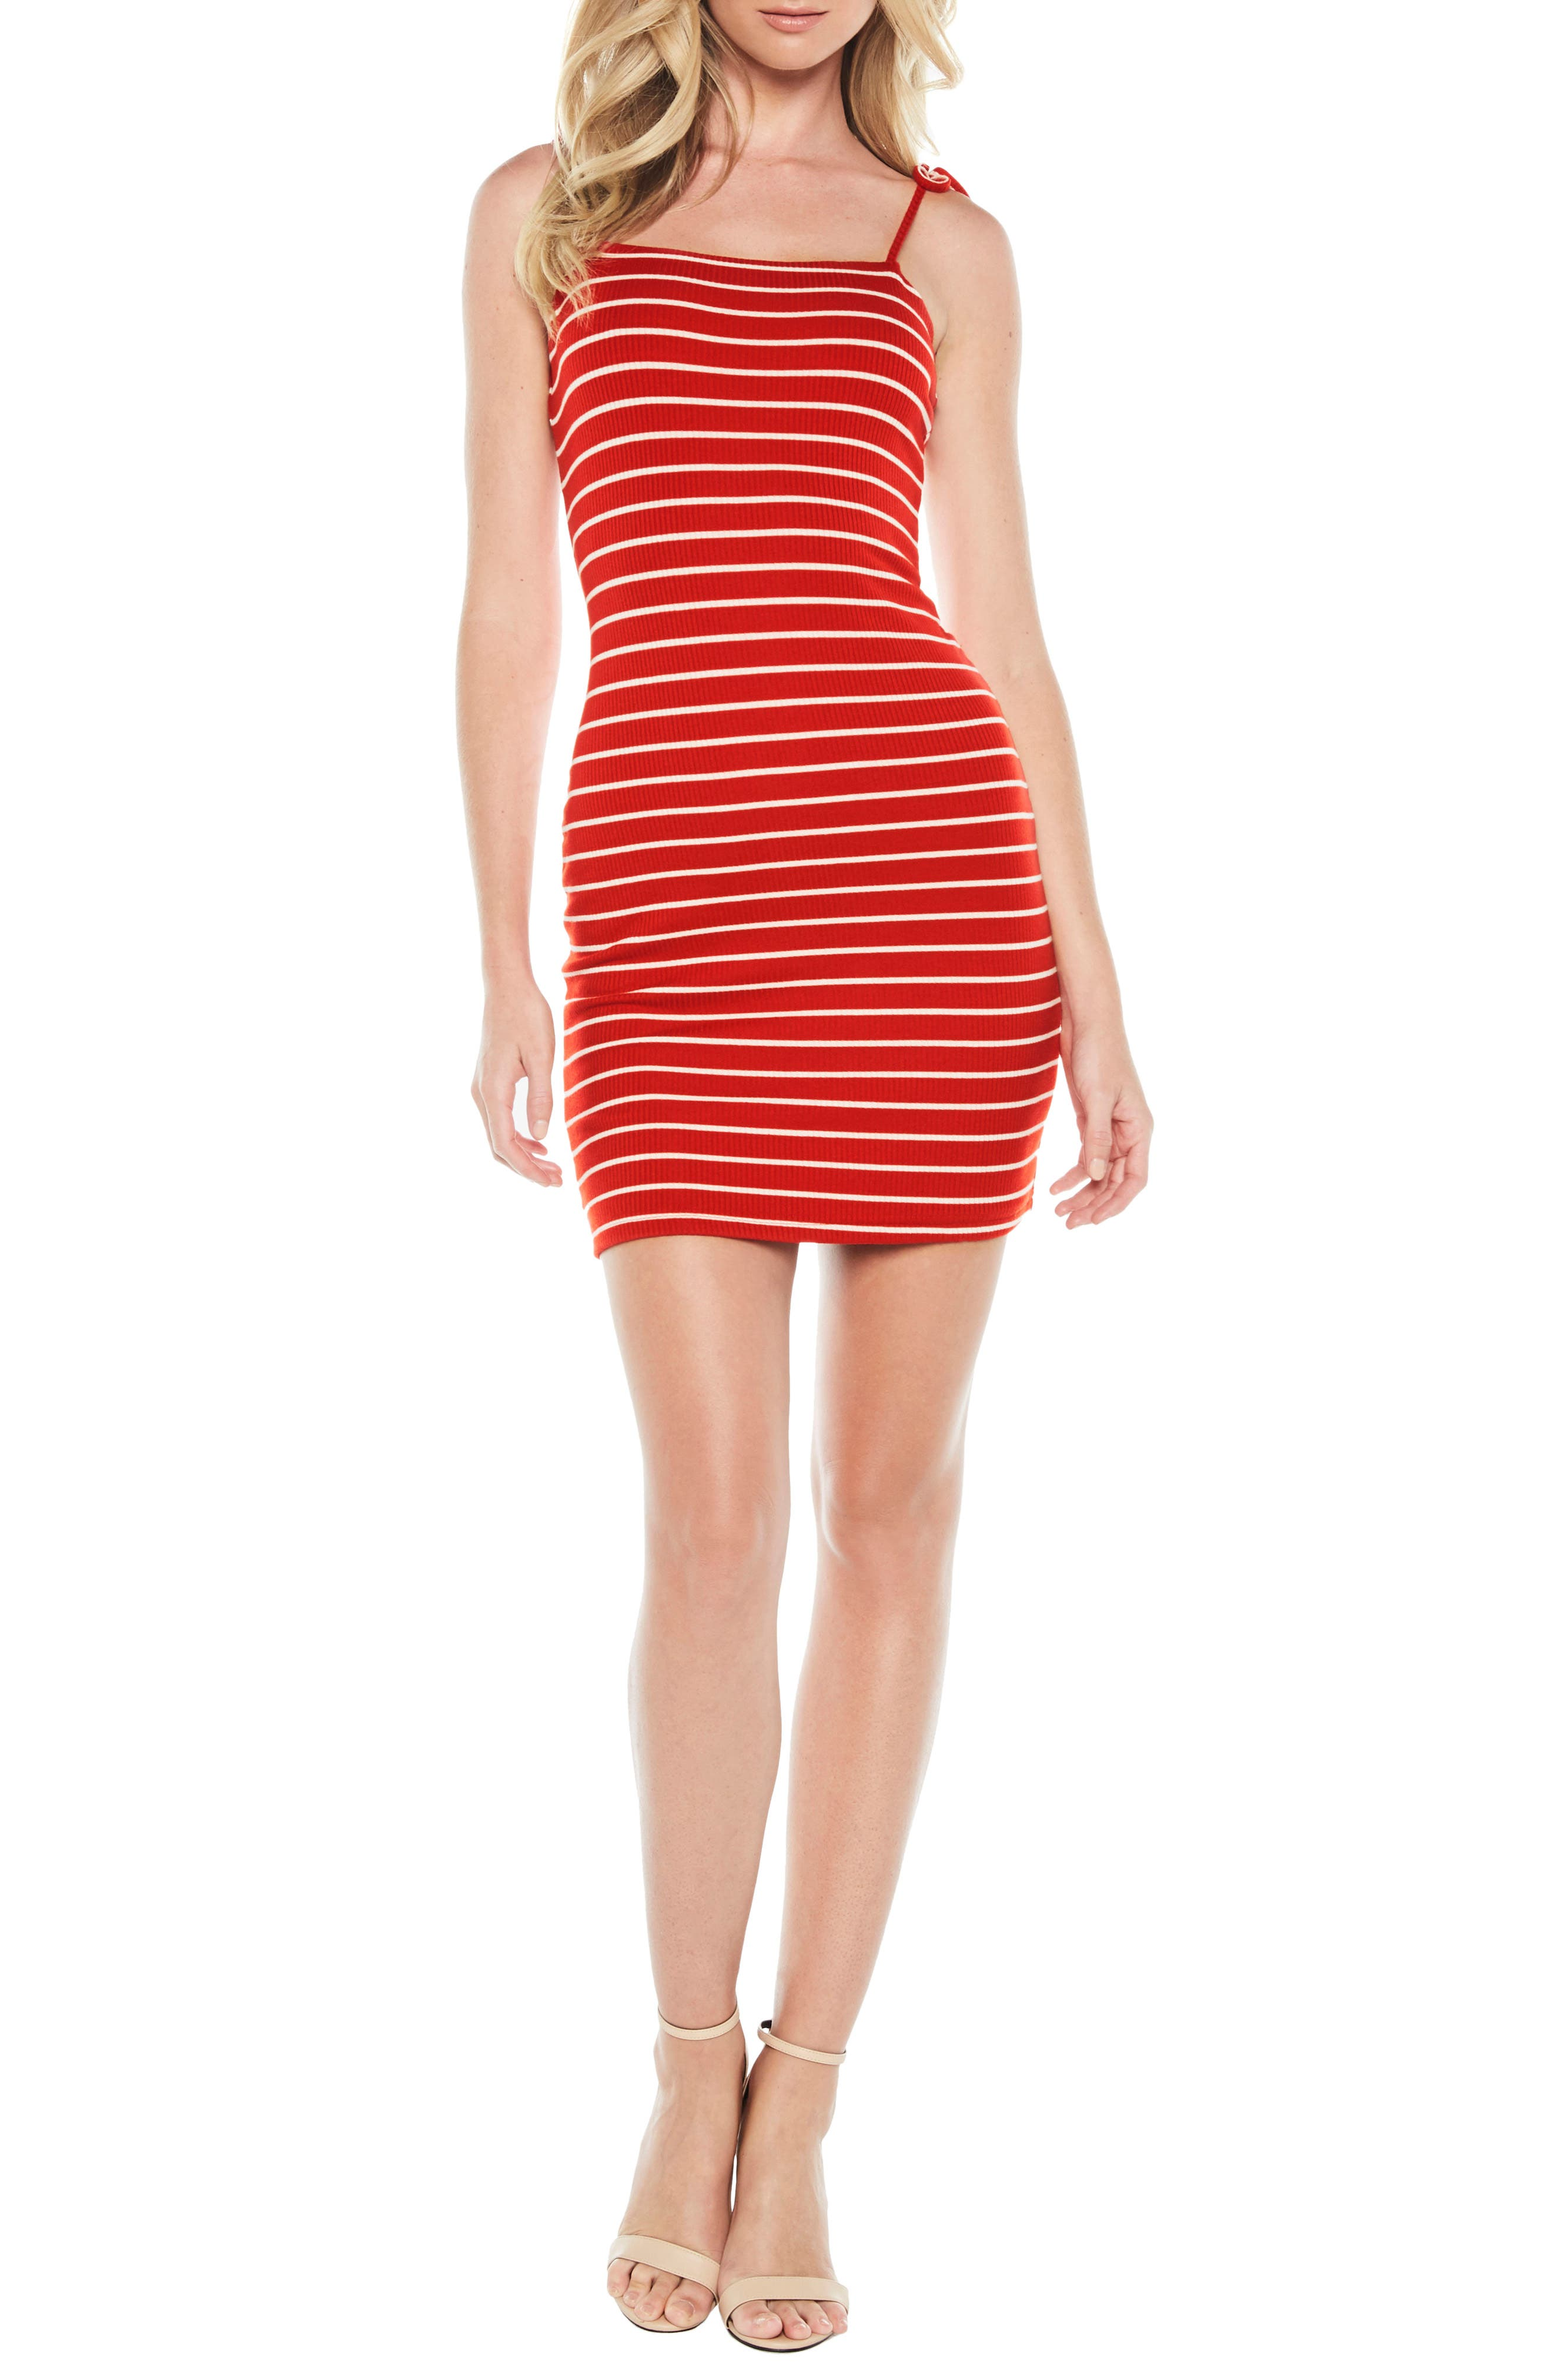 Romy Tie Strap Tube Dress,                             Main thumbnail 1, color,                             Red/ White Stripe